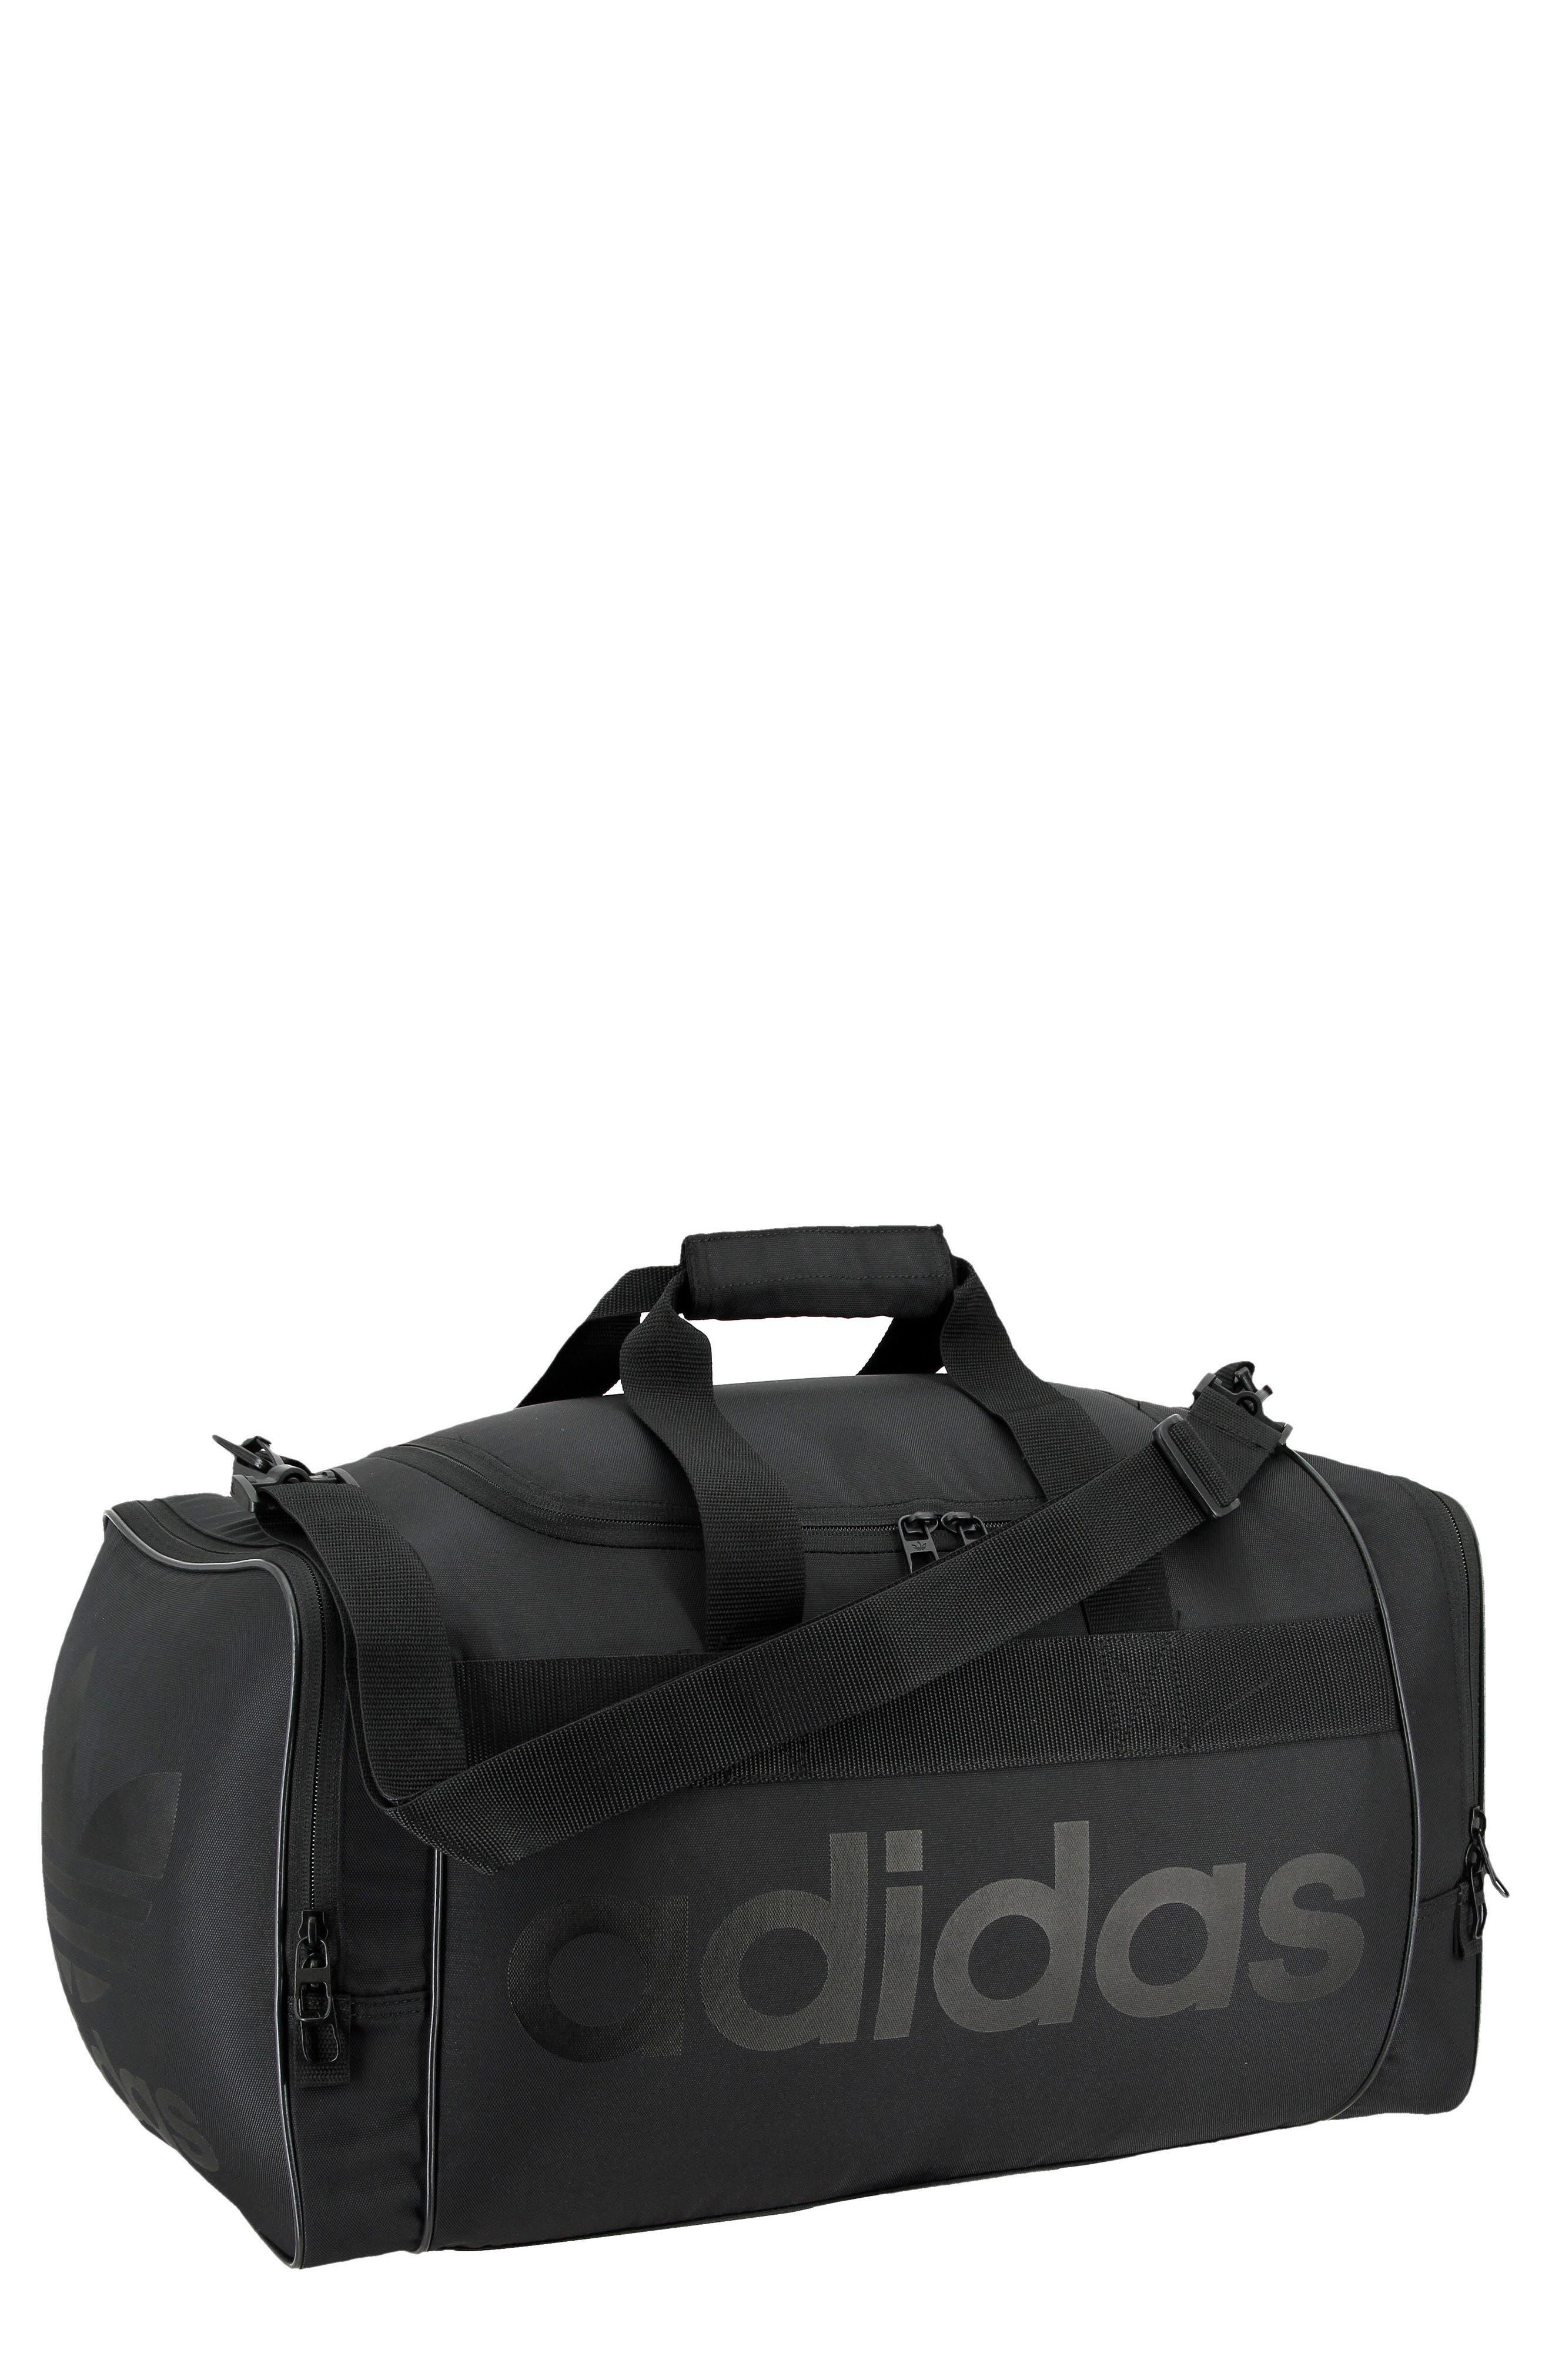 Santiago Duffel Bag,                             Main thumbnail 1, color,                             BLACK/ BLACK